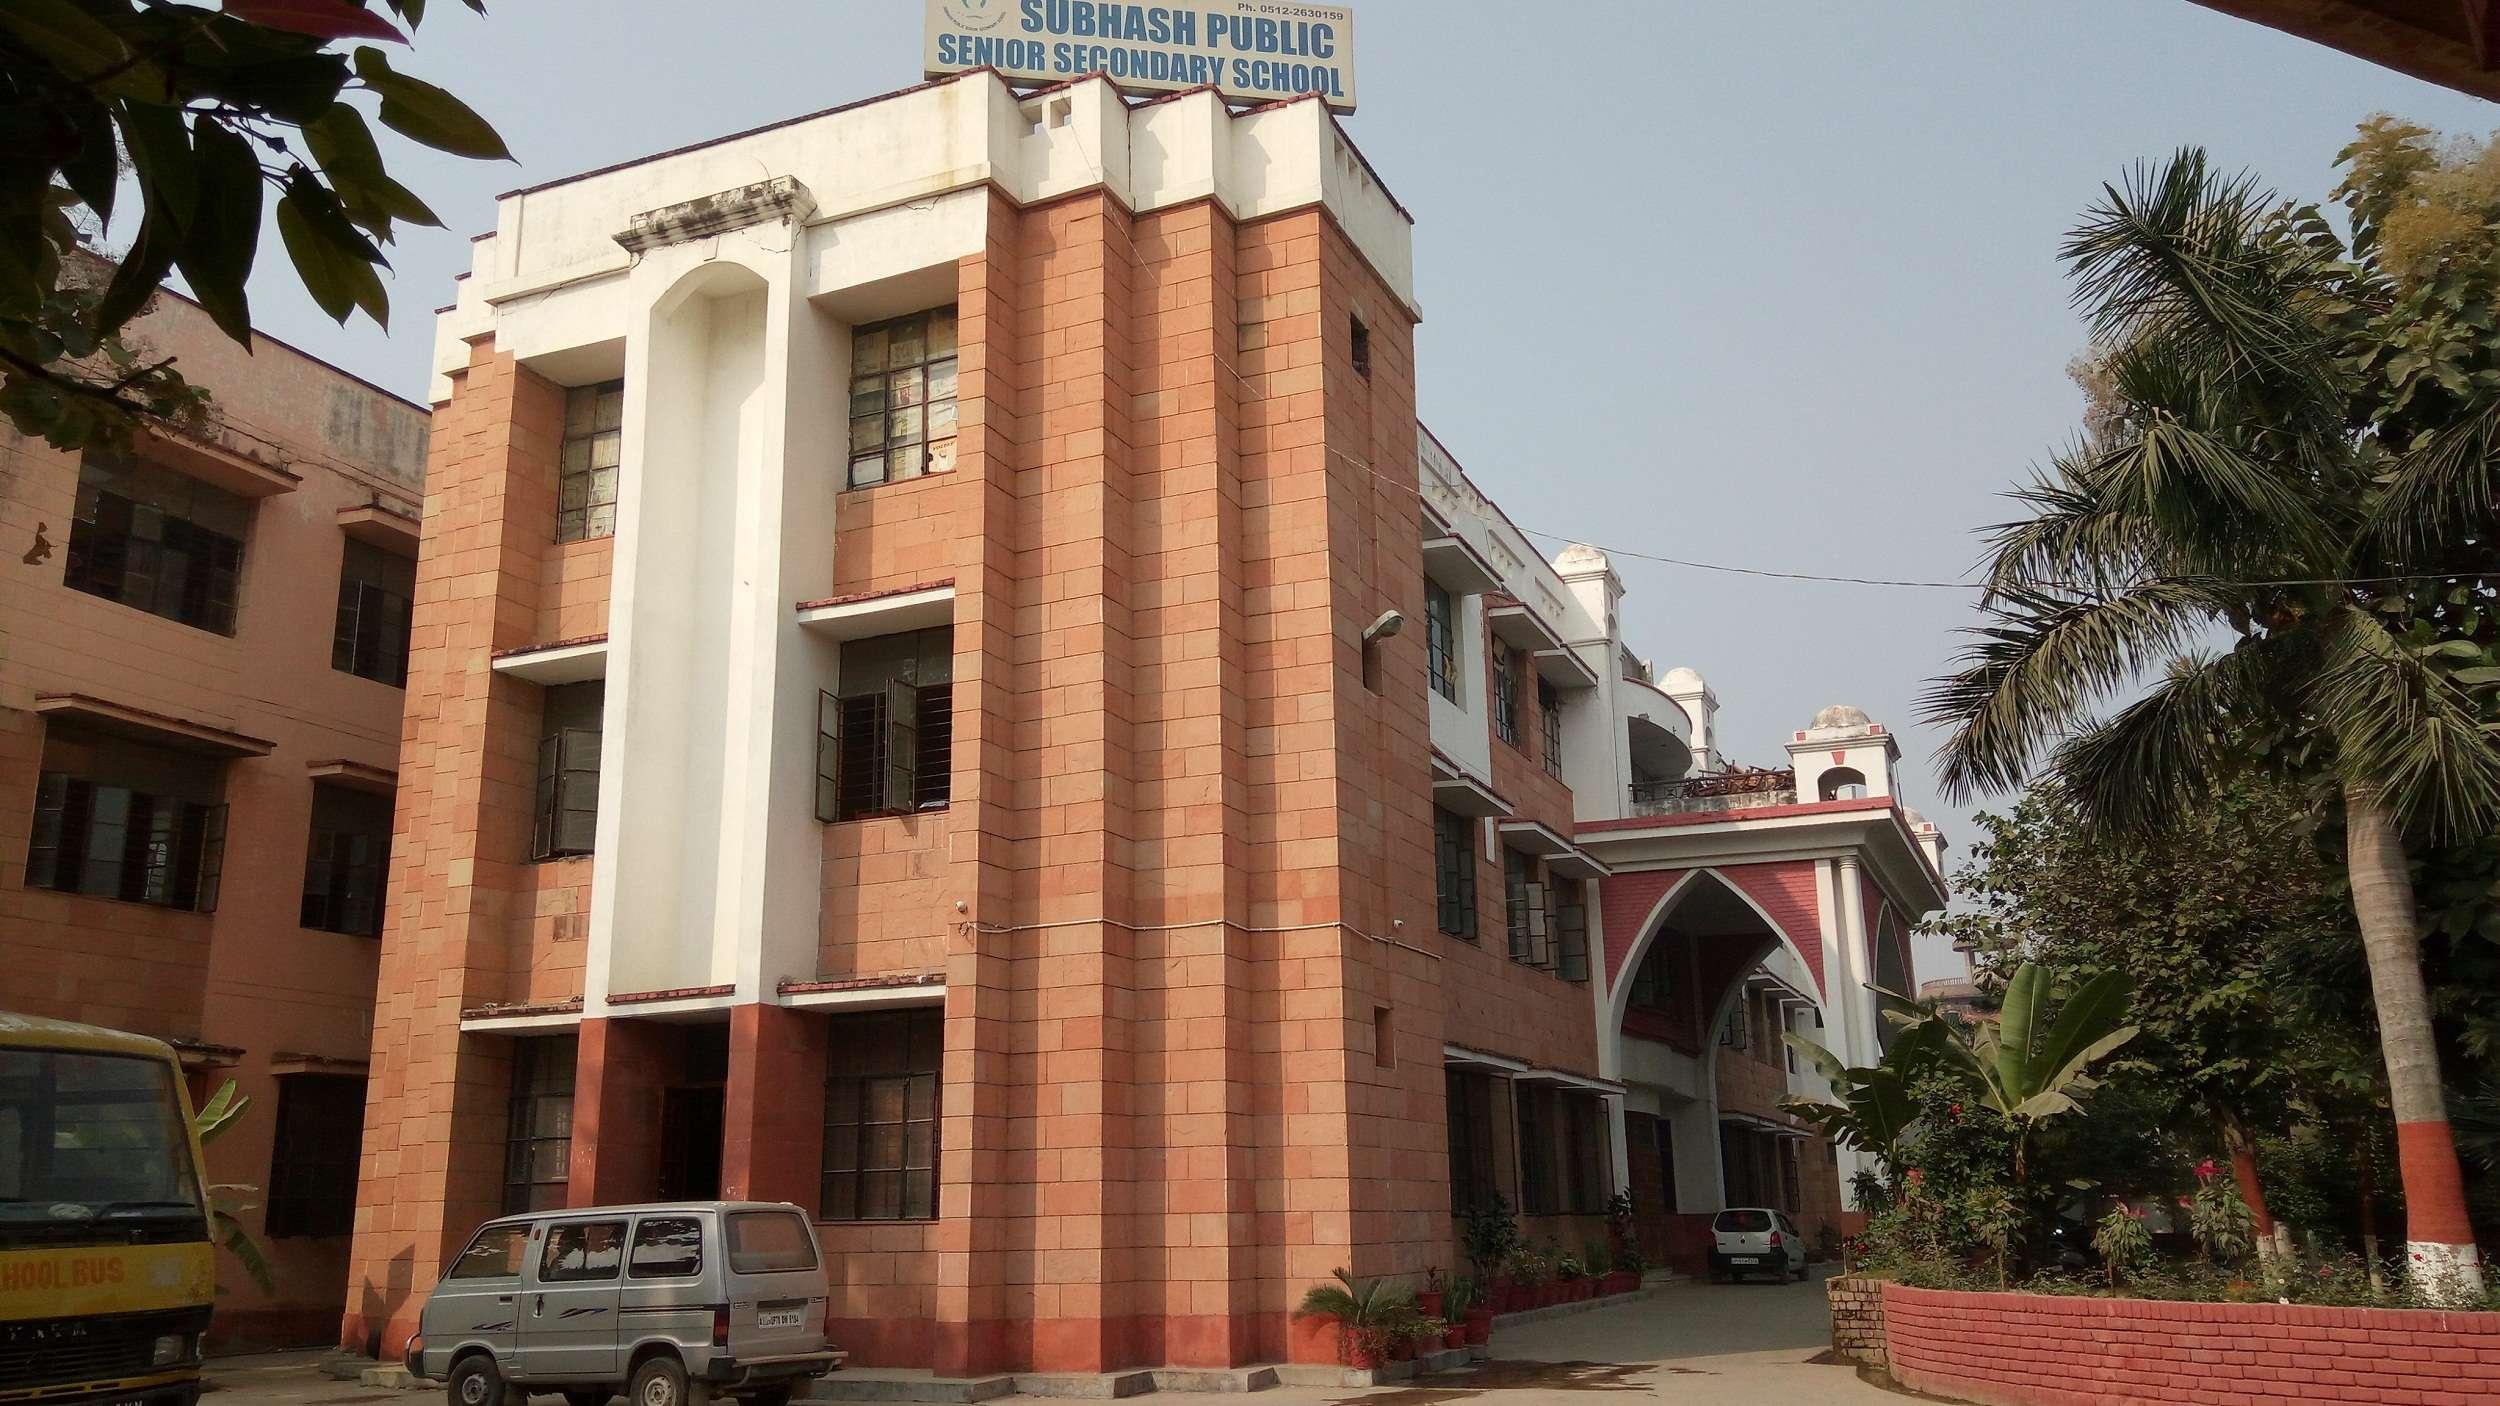 SUBHASH PUBLIC SCHOOL Y BLOCK 1420 KIDWAI NAGAR KANPUR UTTAR PRADESH 2130426